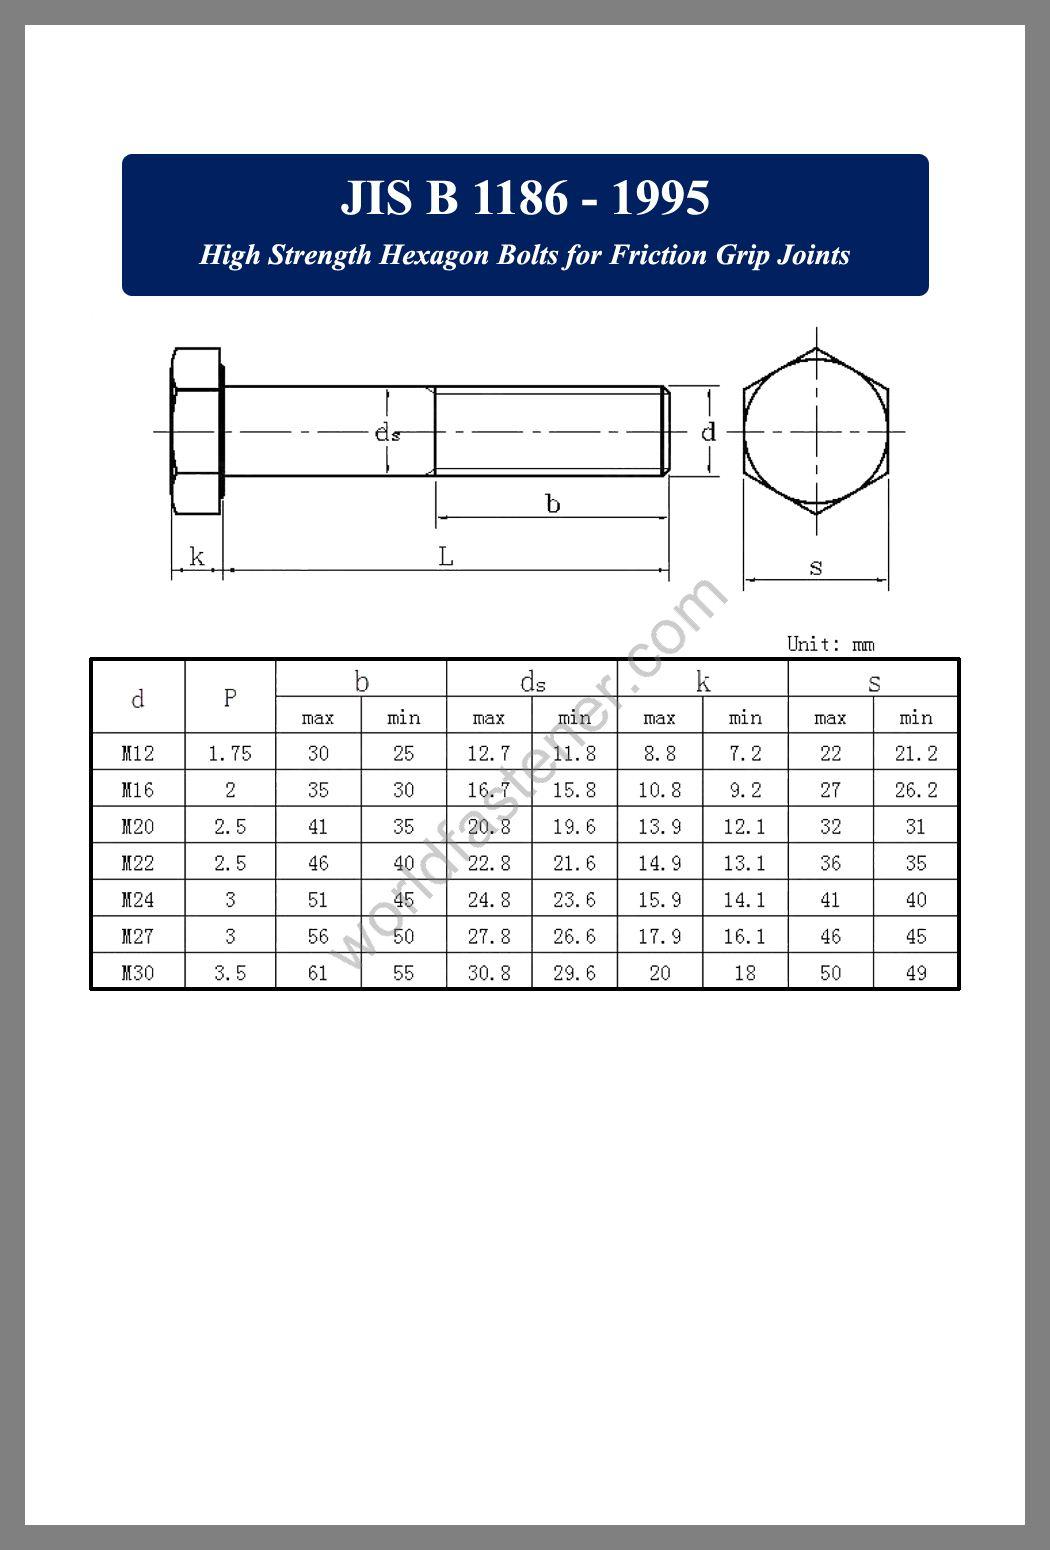 JIS B1186, JIS B1186 High Strength Hexagon Bolts For Friction Grip Joints, fastener, screw, bolt, JIS bolt, JIS fastener